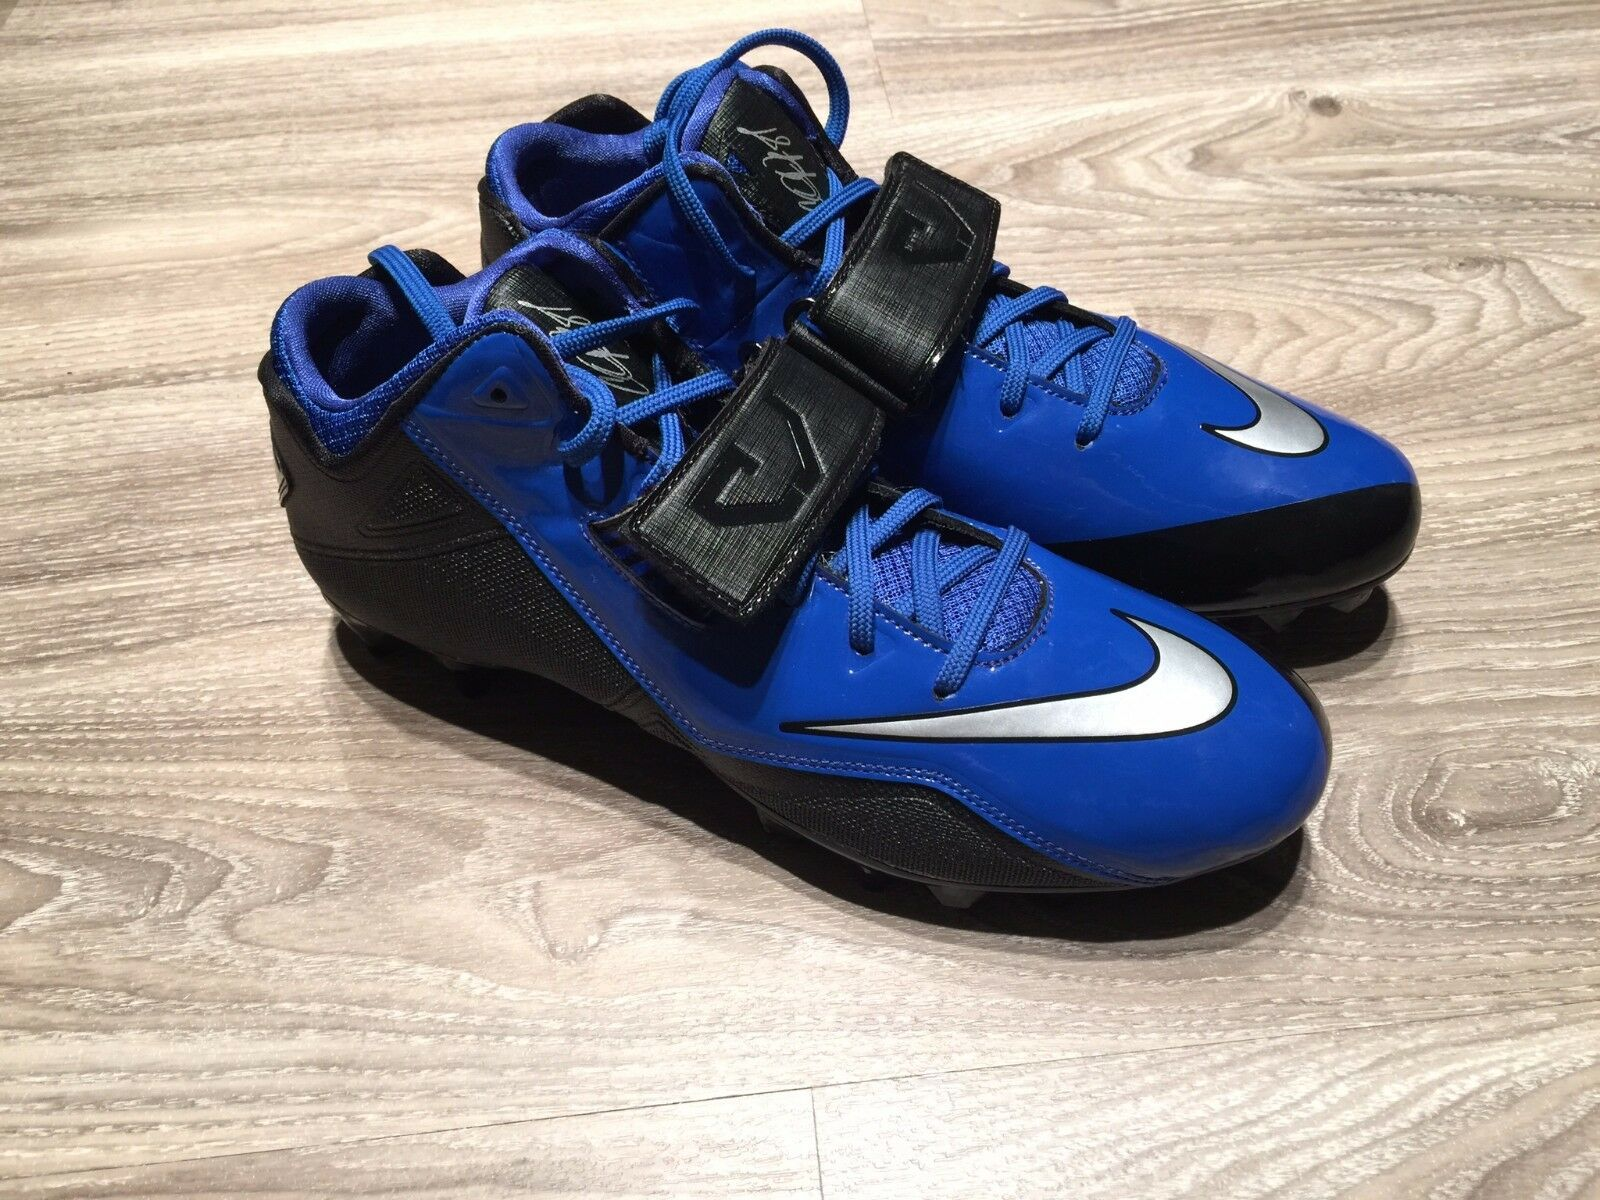 nike cj megatron strike 2 td metà blu blu blu e nero 678119-004 calcio calcio 11,5   Qualità Primacy    Gentiluomo/Signora Scarpa  df9abd